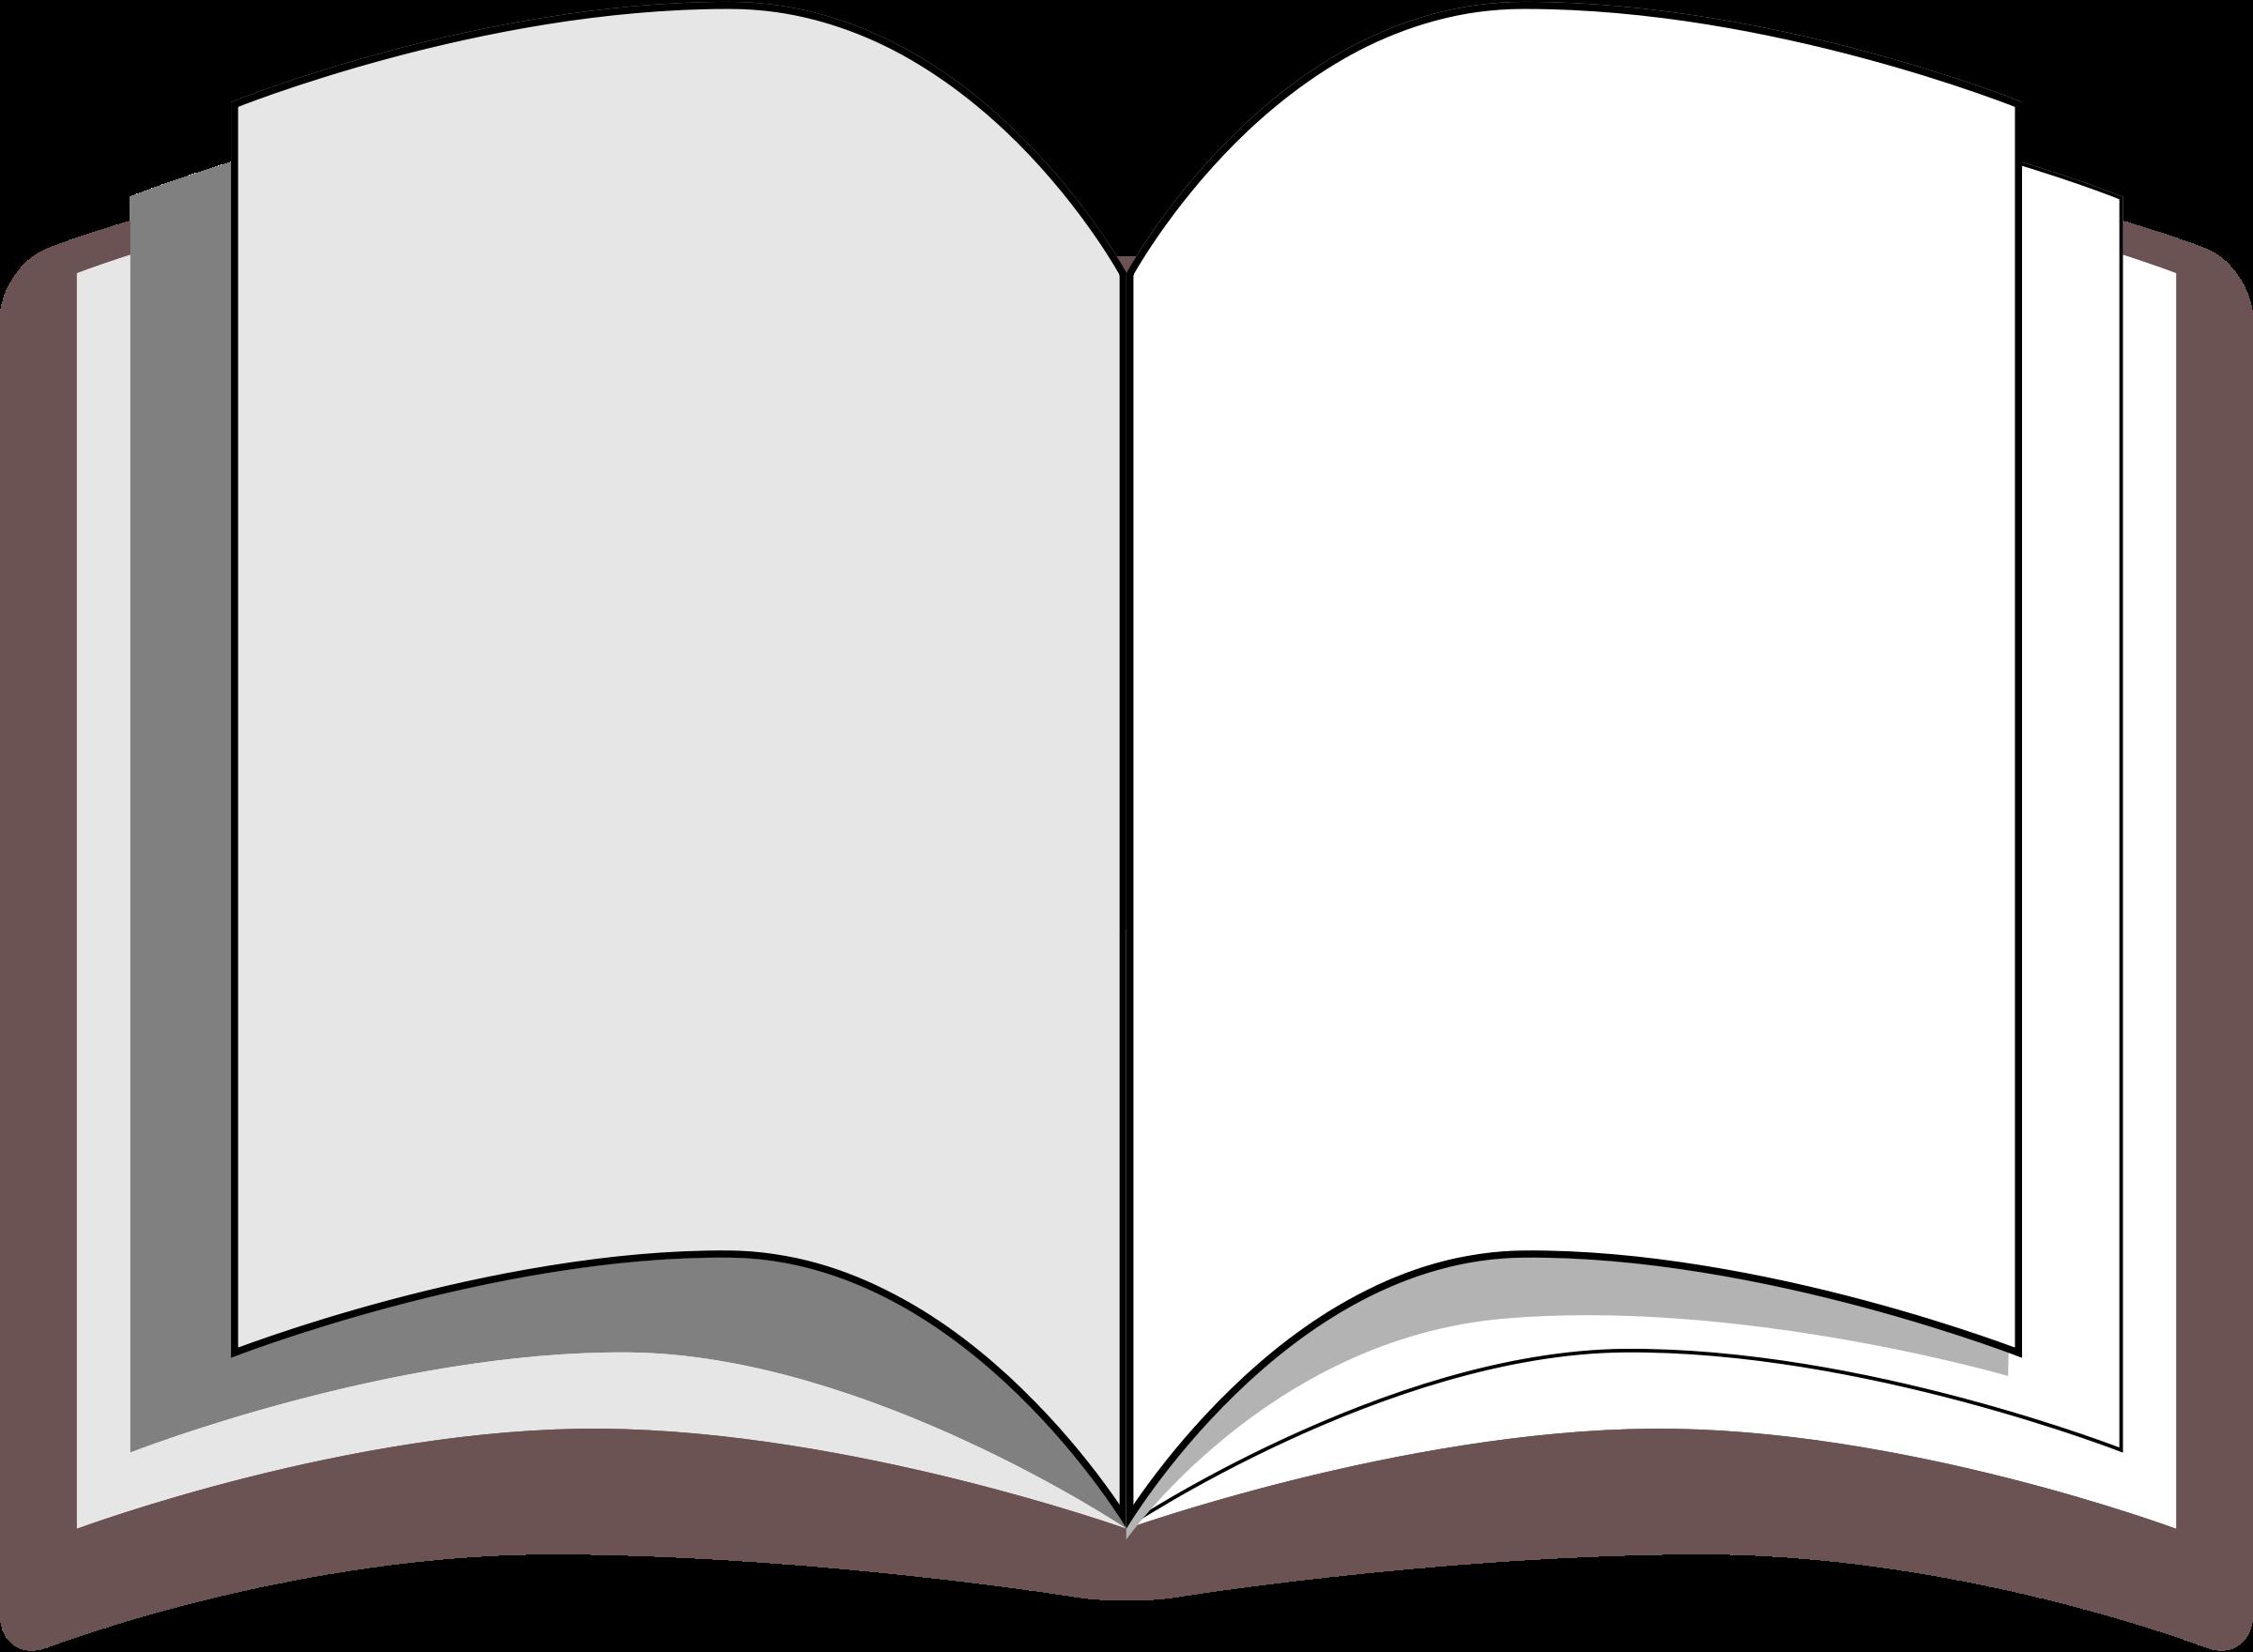 medium resolution of free open book clipart public domain open book clip art images 3 2